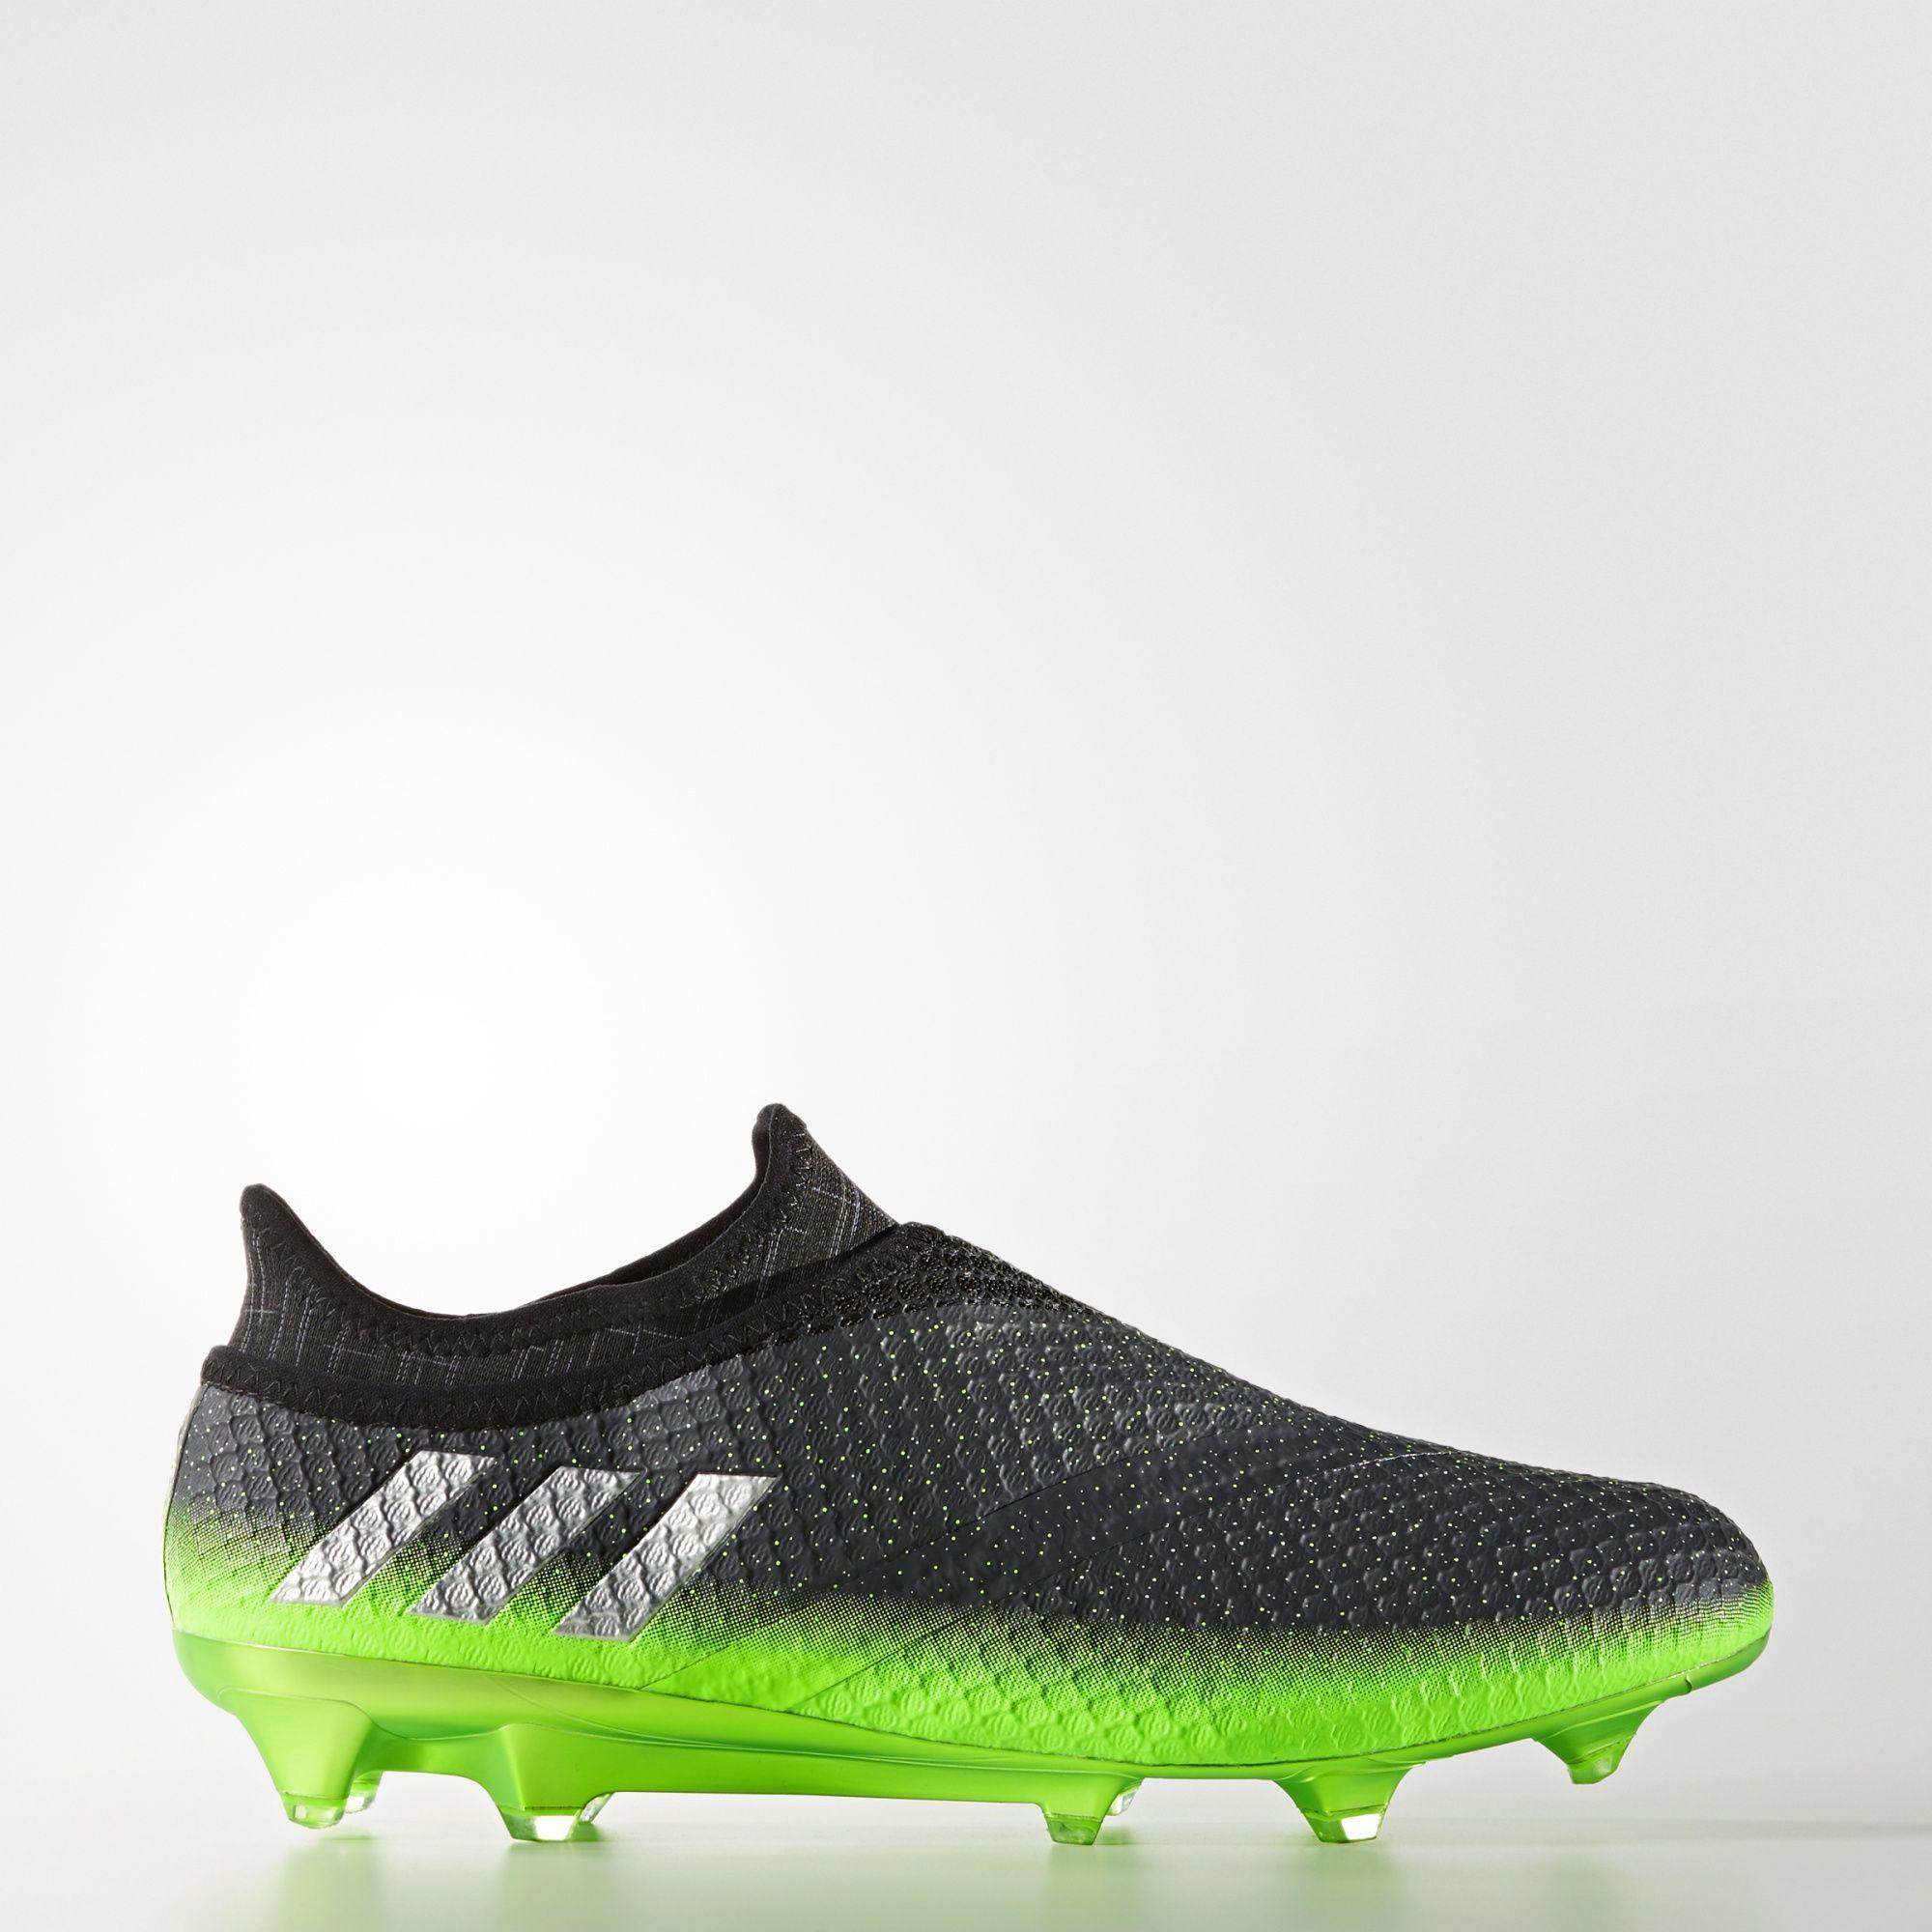 f1c71788c adidas - Messi 16+ Pureagility Firm Ground Boots